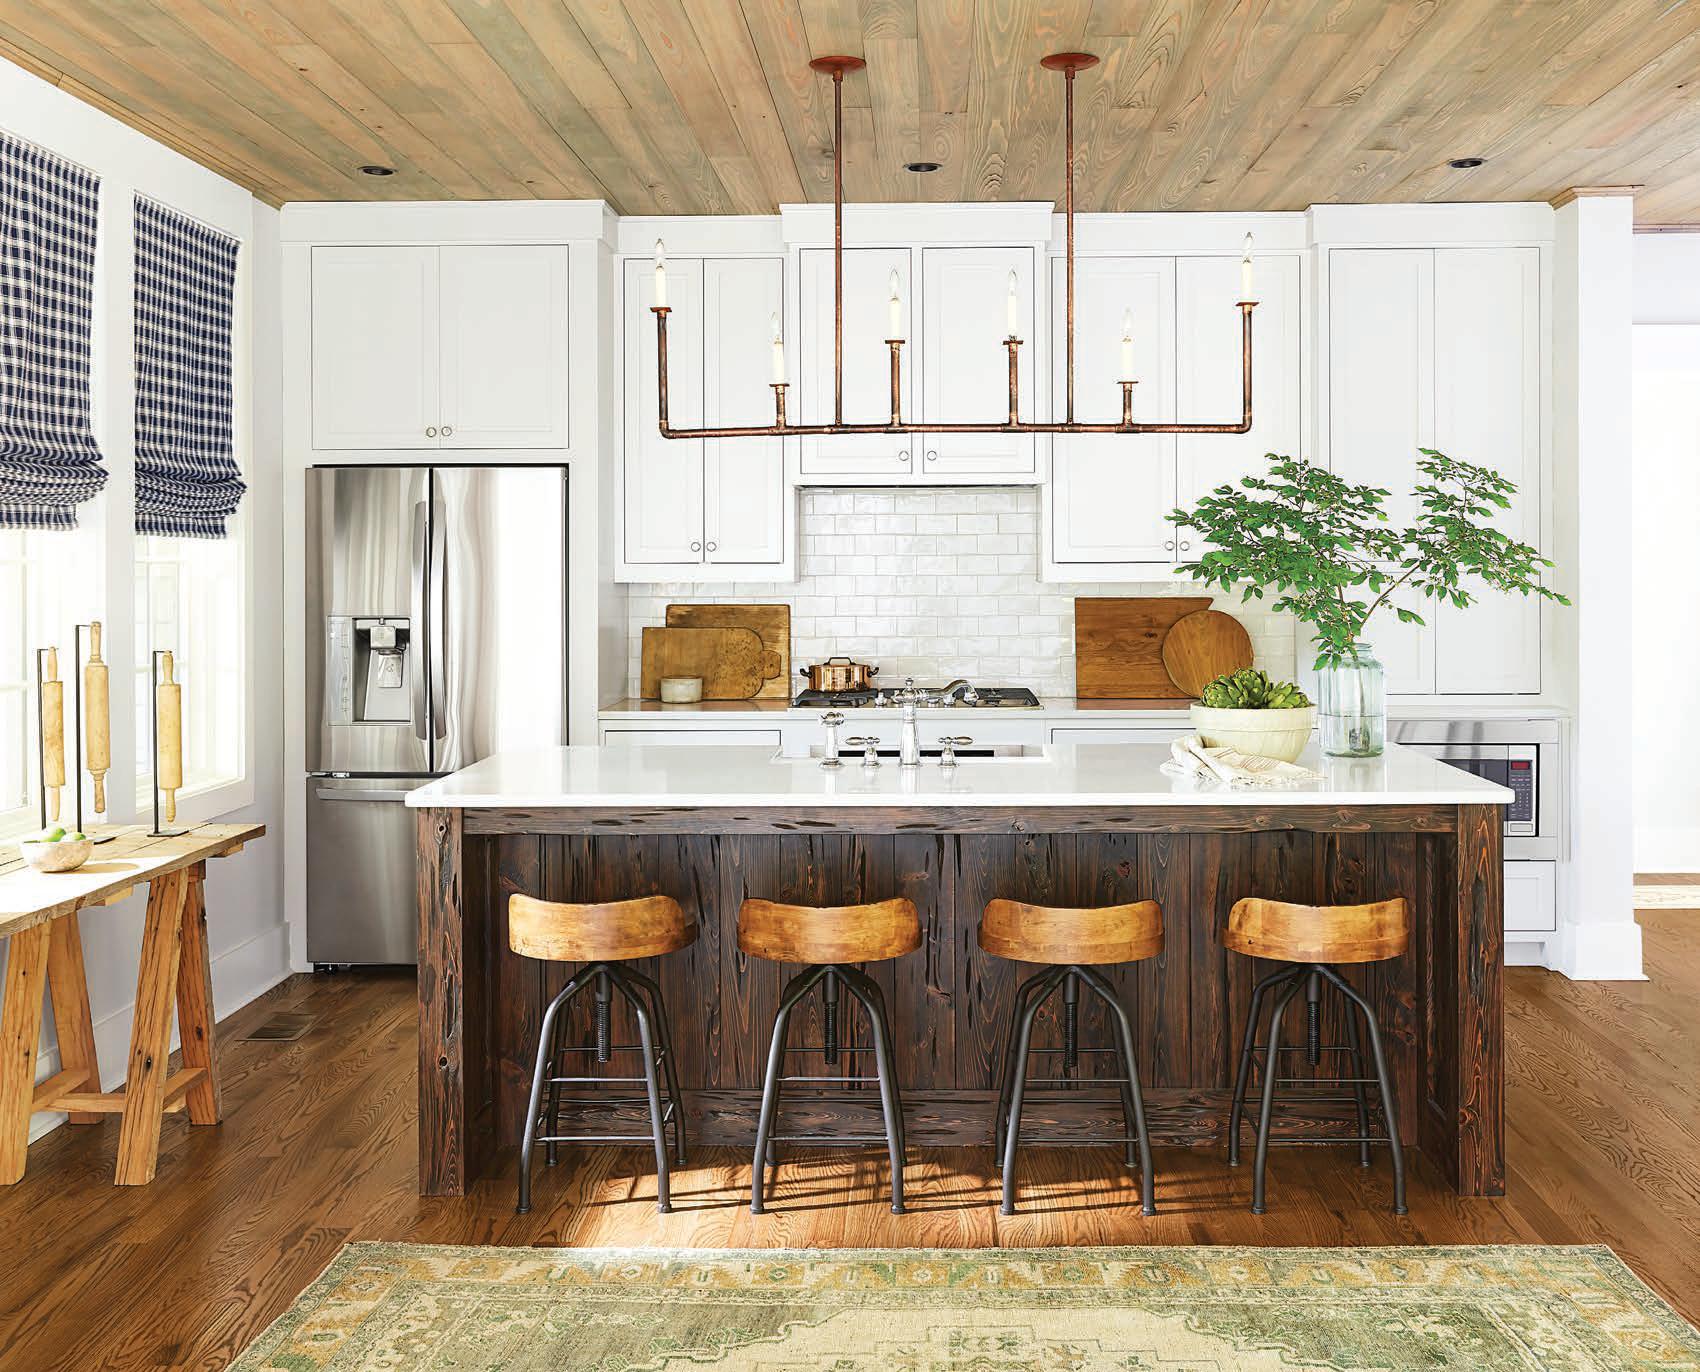 Adjustable Industrial Hickory Wood Swivel Stool Lake House Kitchen Home Decor Kitchen Kitchen Decor